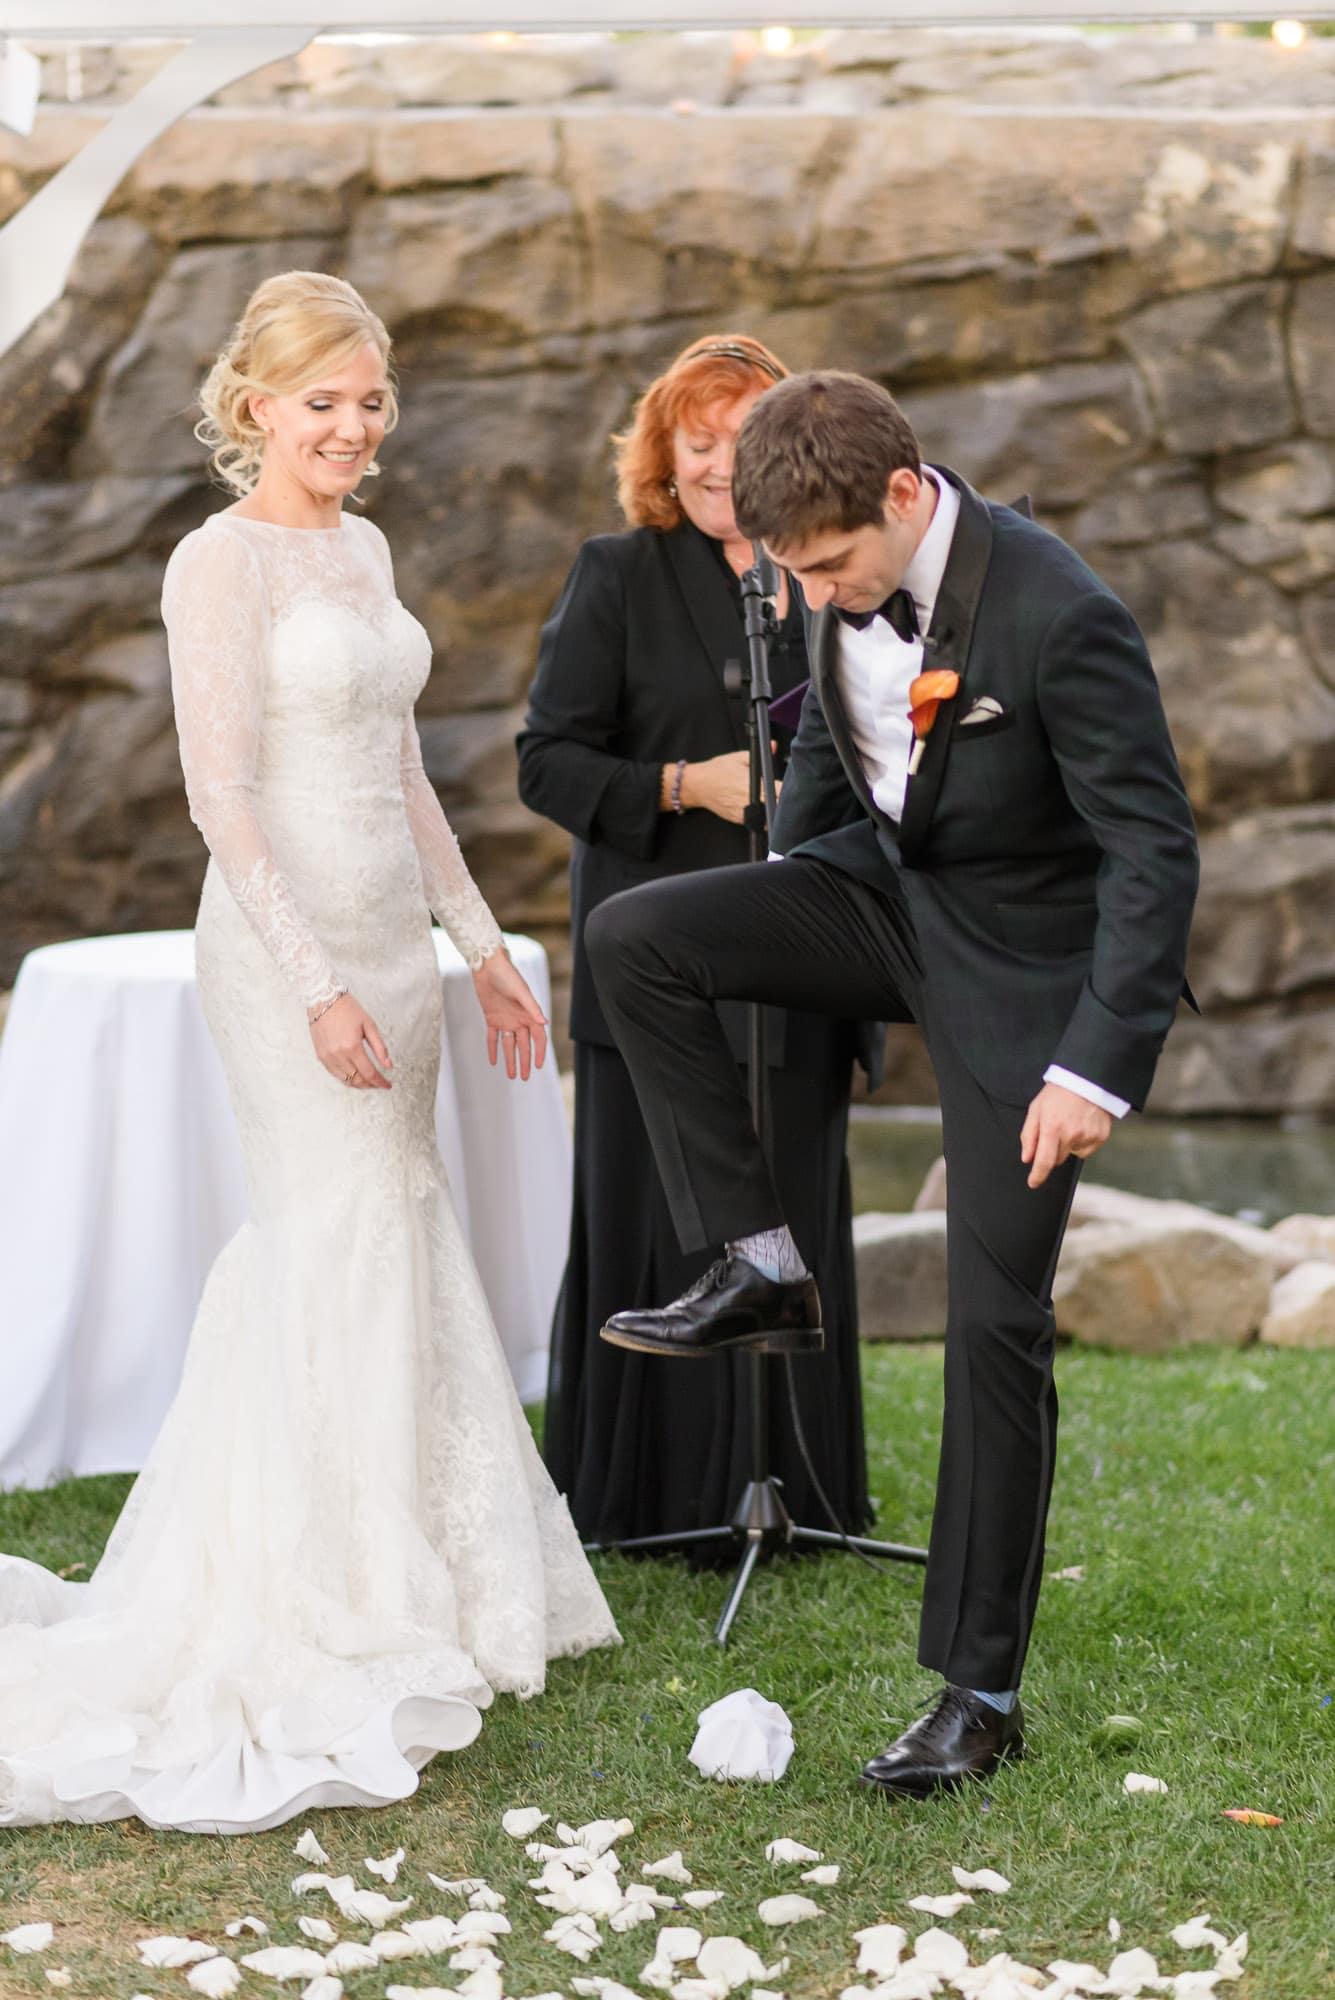 055_Alan_and_Heidi_Los_Angeles_Equestrian_Center_Wedding